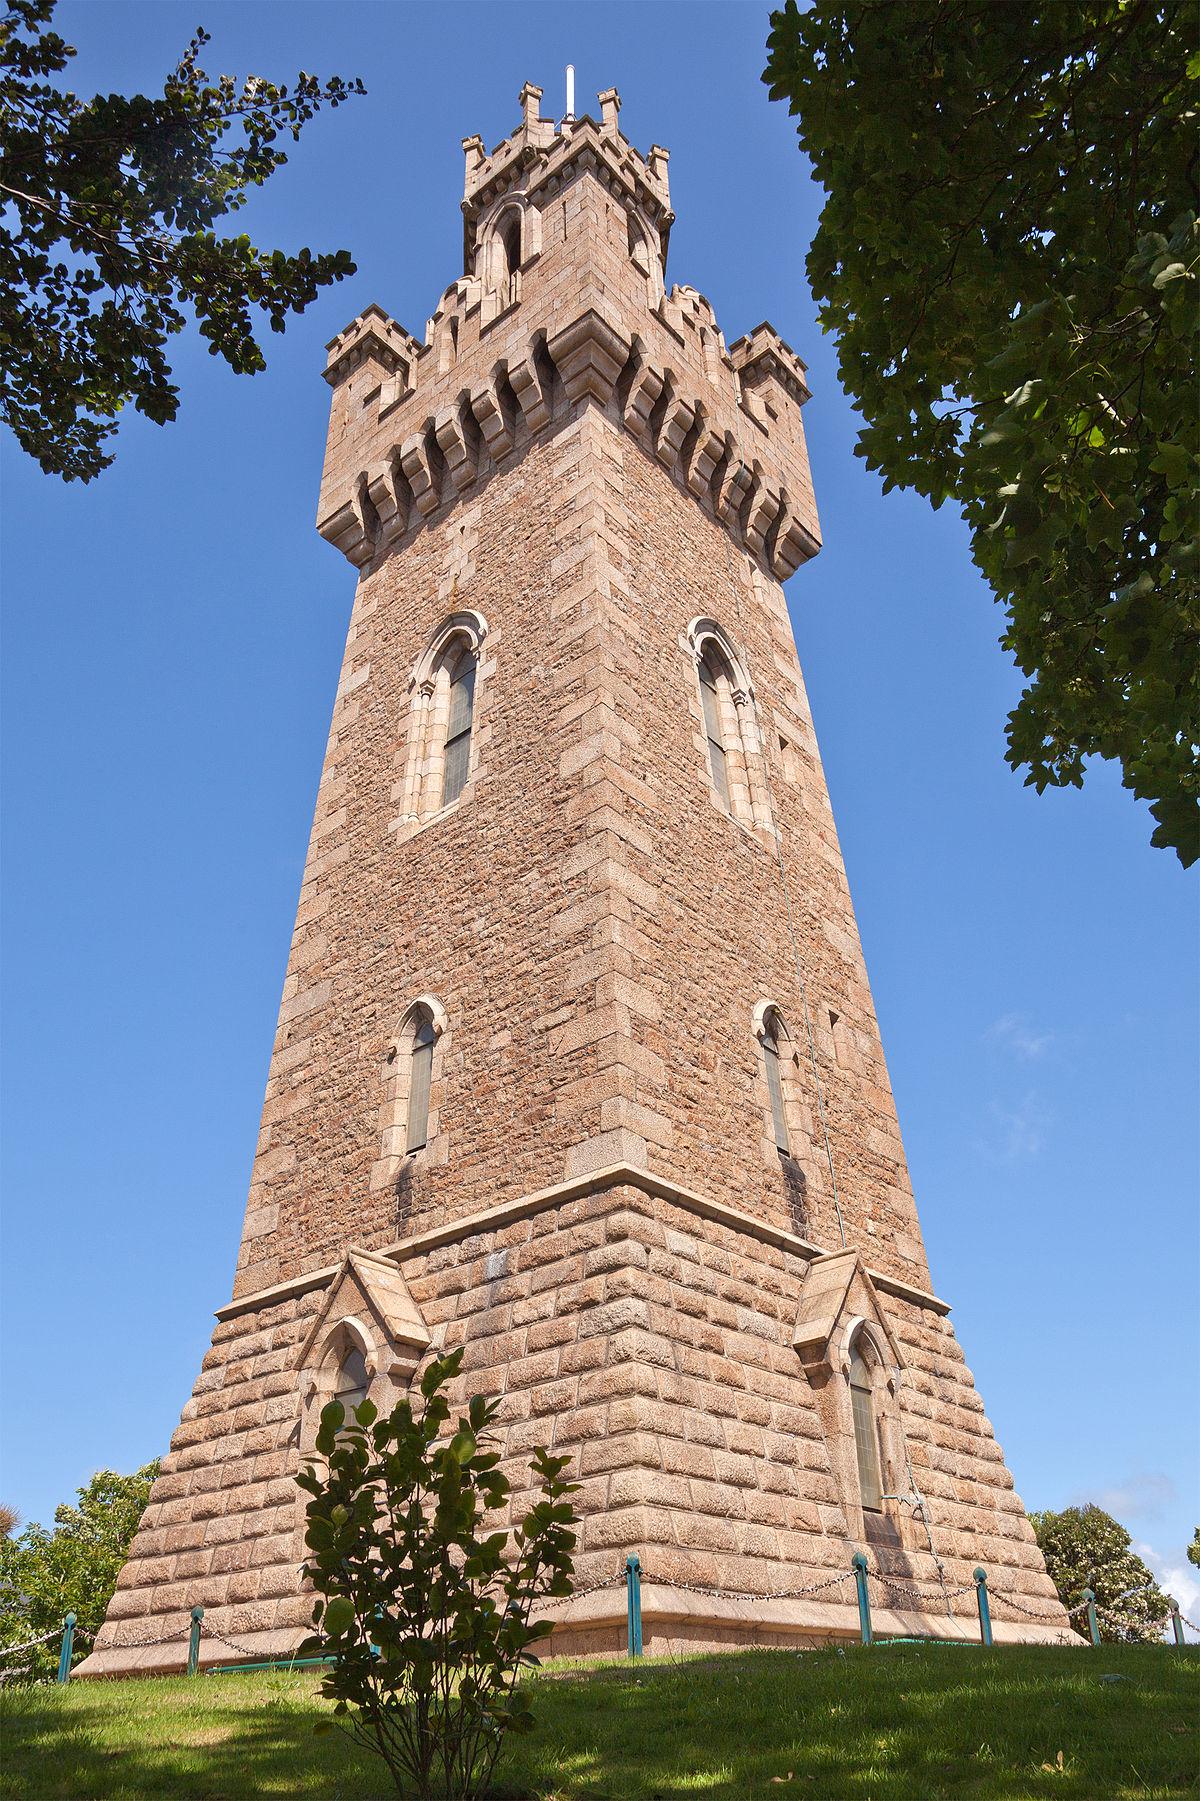 Victoria Tower, Guernsey - Wikipedia